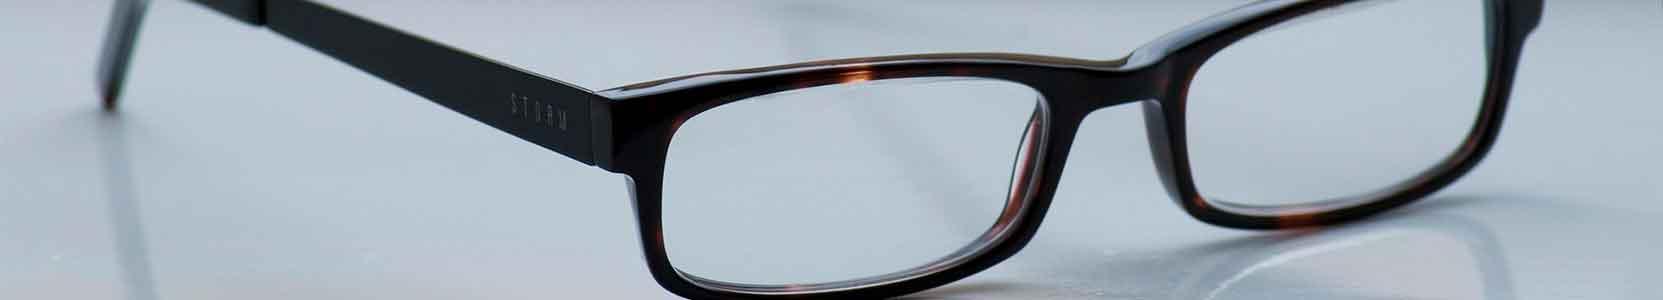 Midtown NYC Eye Glass Lenses